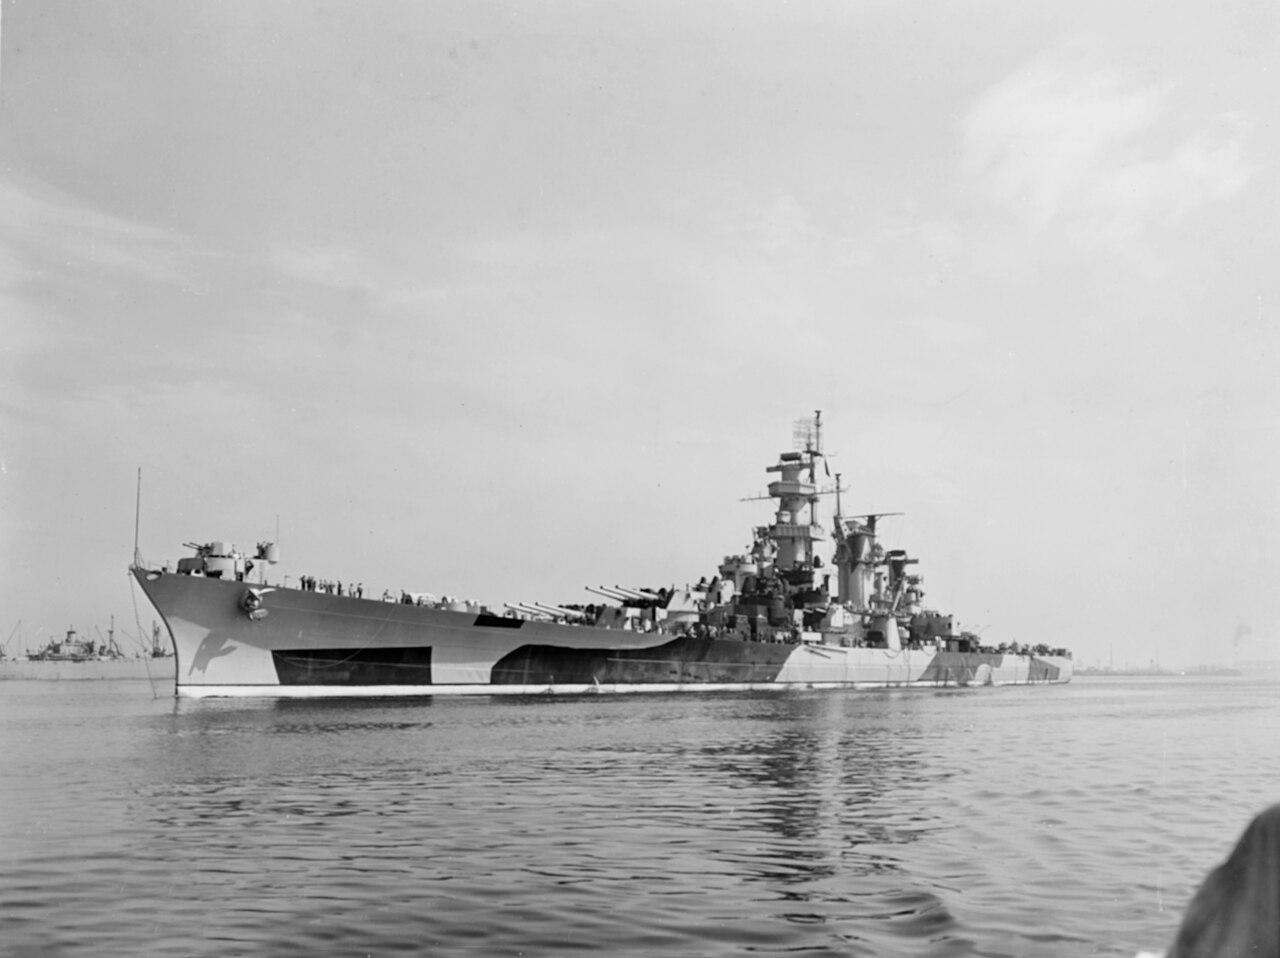 1280px-USS_Alaska_(CB-1)_off_the_Philade